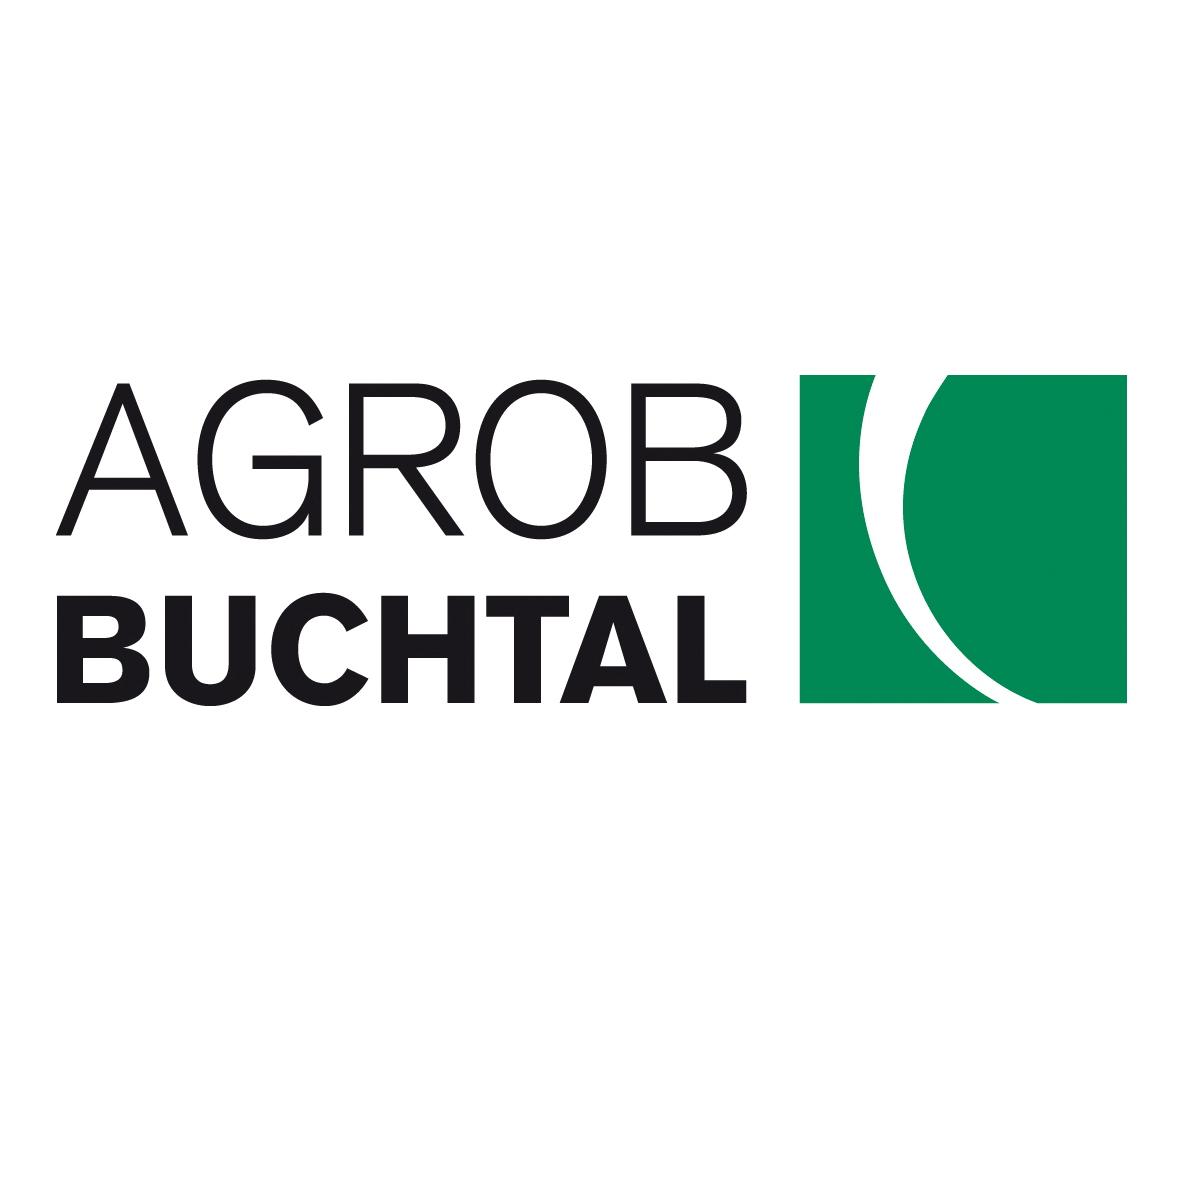 Agrob Buchtal Logo Quadrat. (Logo AGROB BUCHTAL_kurz_Quadrat)